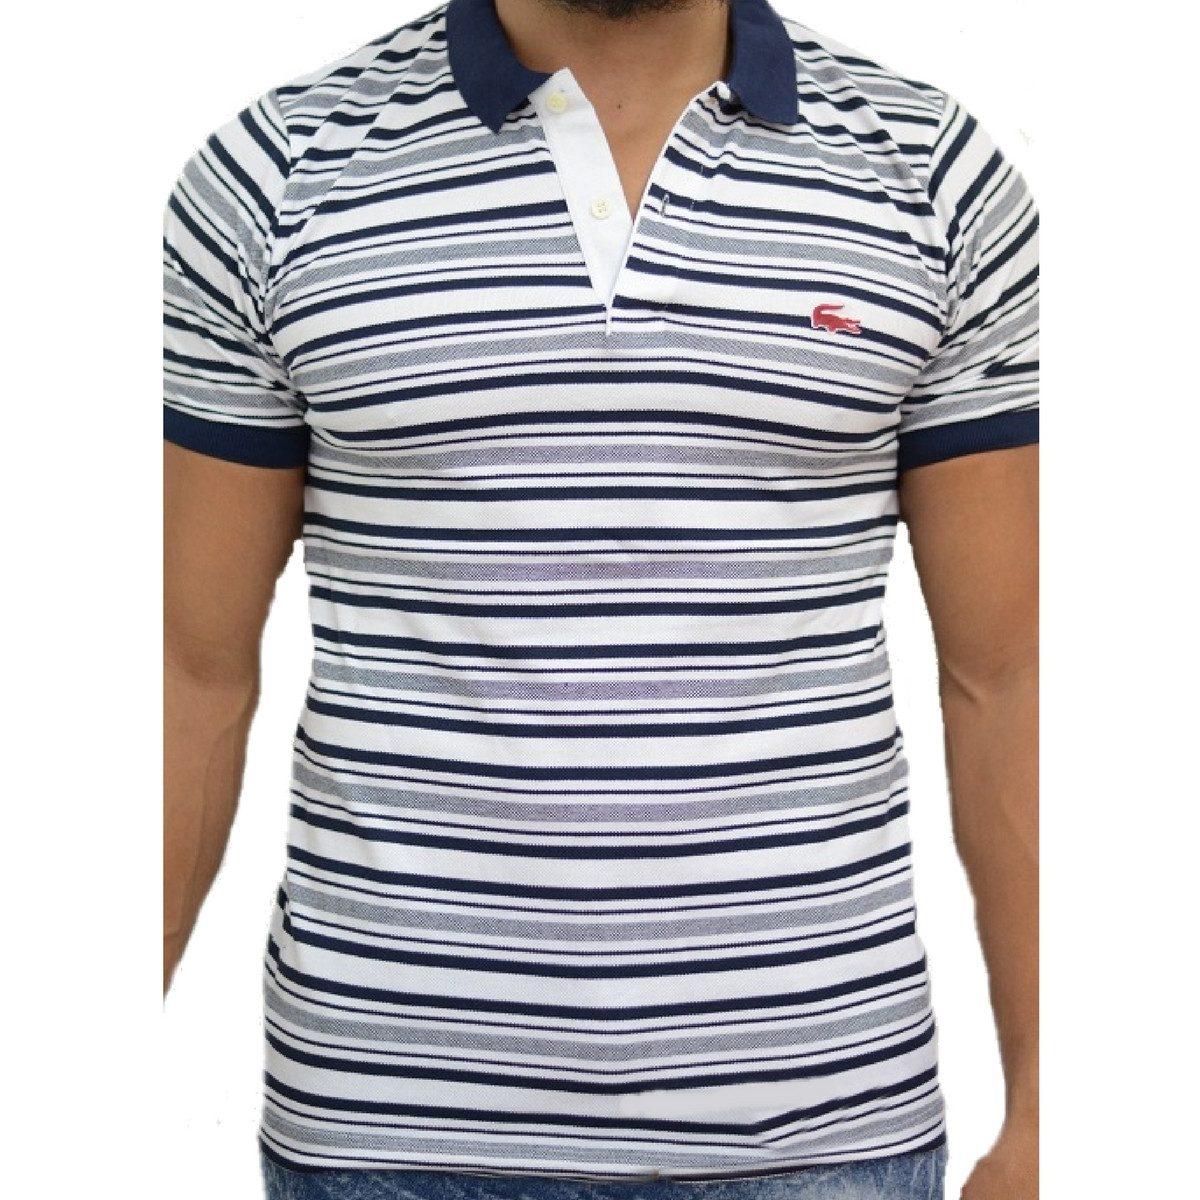 eb18fb1d44d3f Camisa Gola Polo Lacoste Emborrachada Serie Especial - R  139,97 em ...